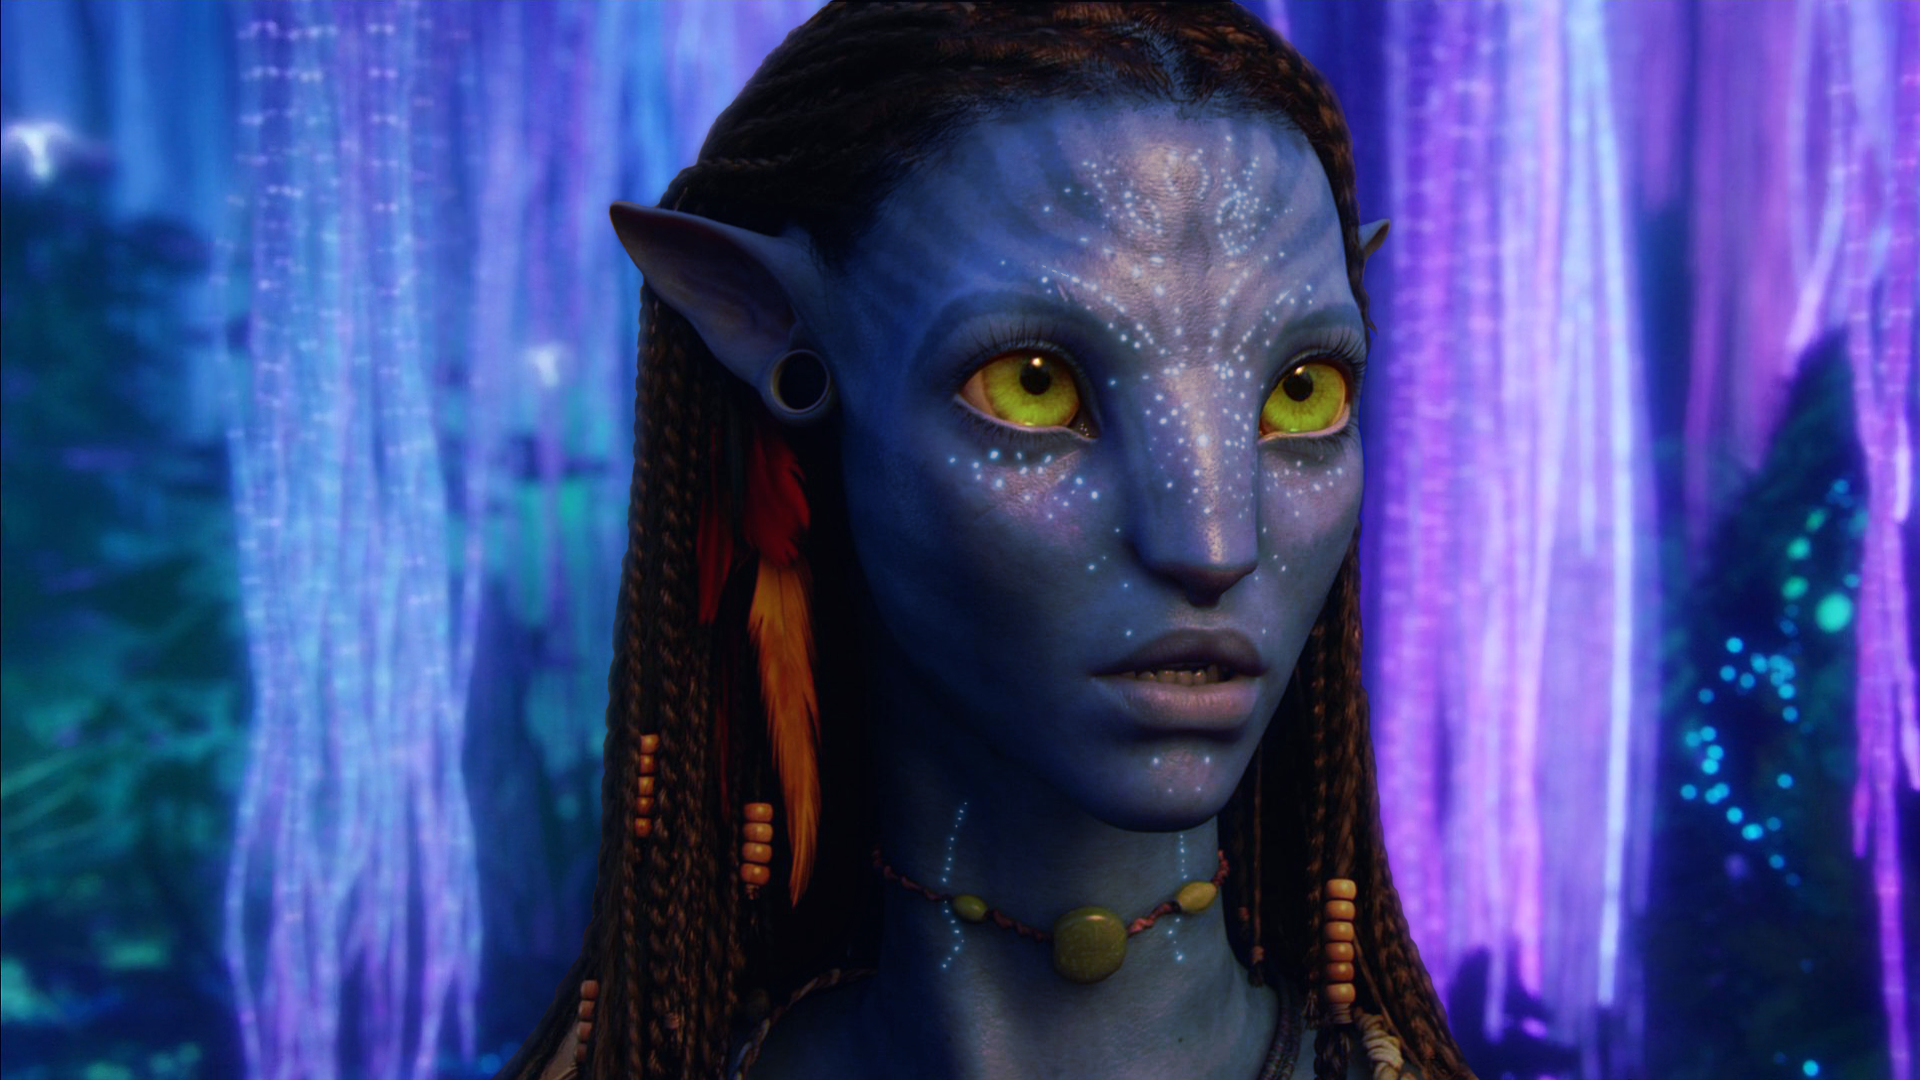 Free Hd Movie Download Point Avatar 2009 Free Hd Movie: Avatar HD Wallpaper